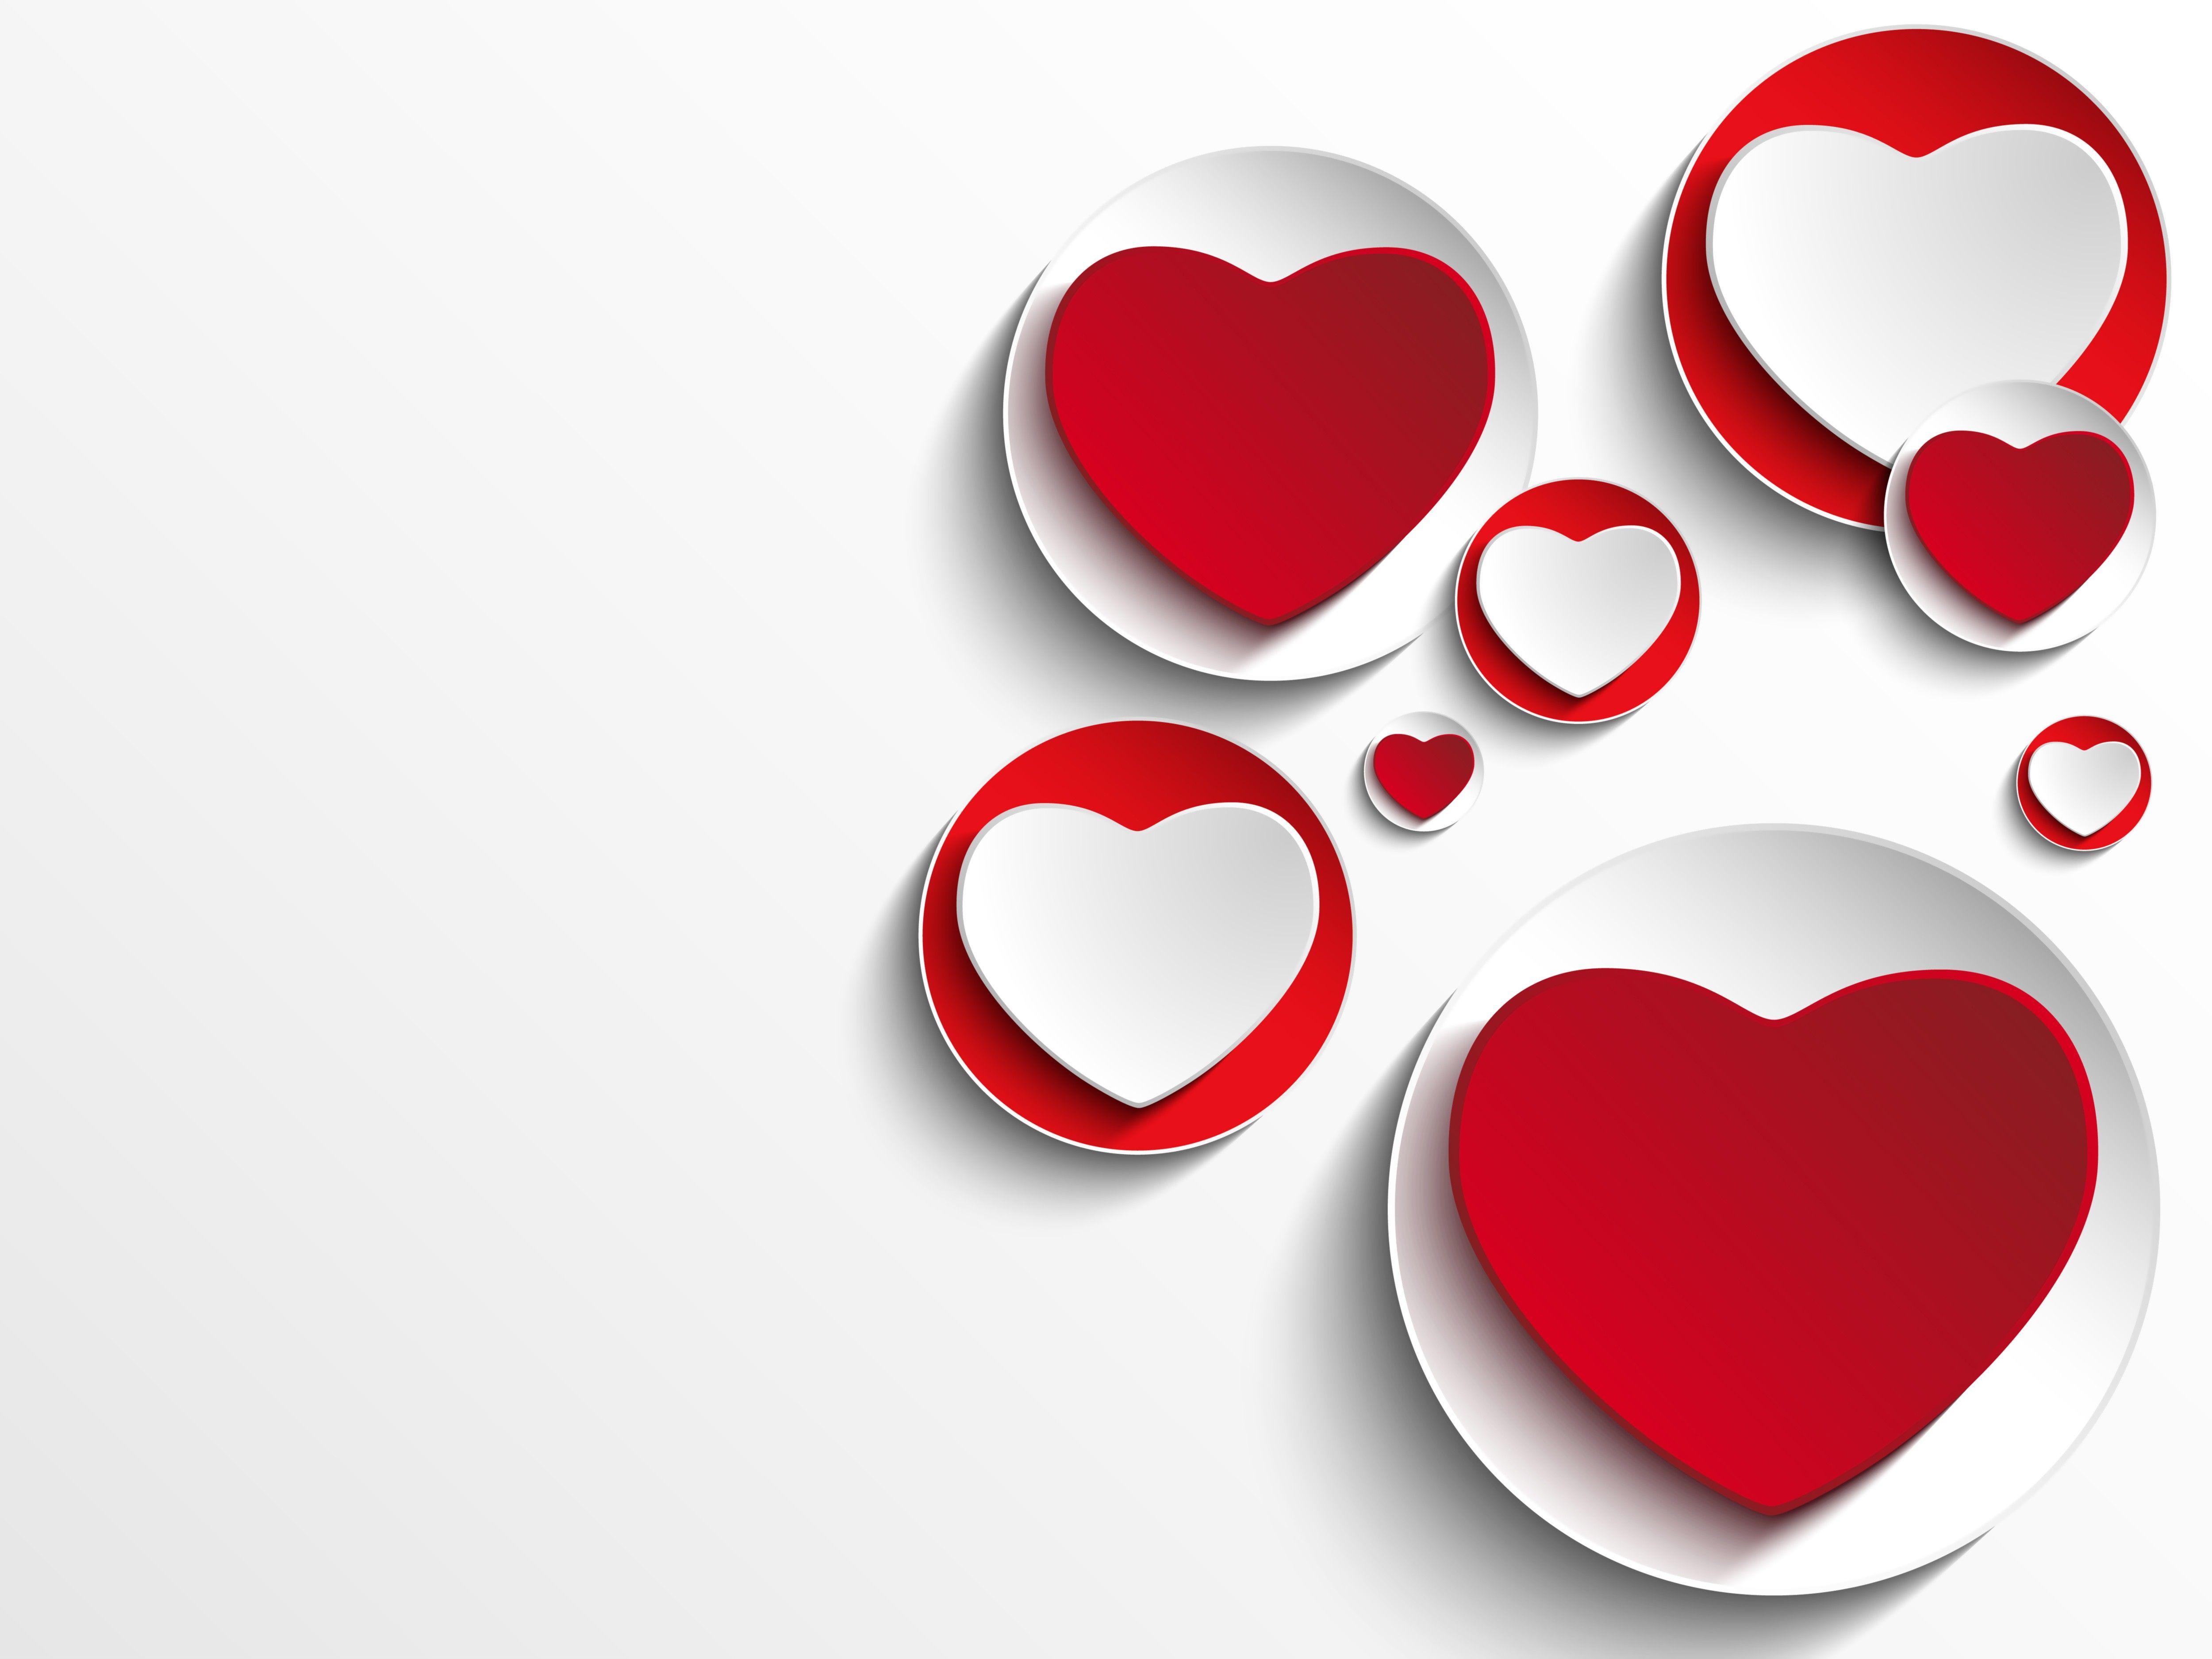 Awesome Vector Love Love Wallpaper Love Hd Wallpaper Romantic Wallpaper